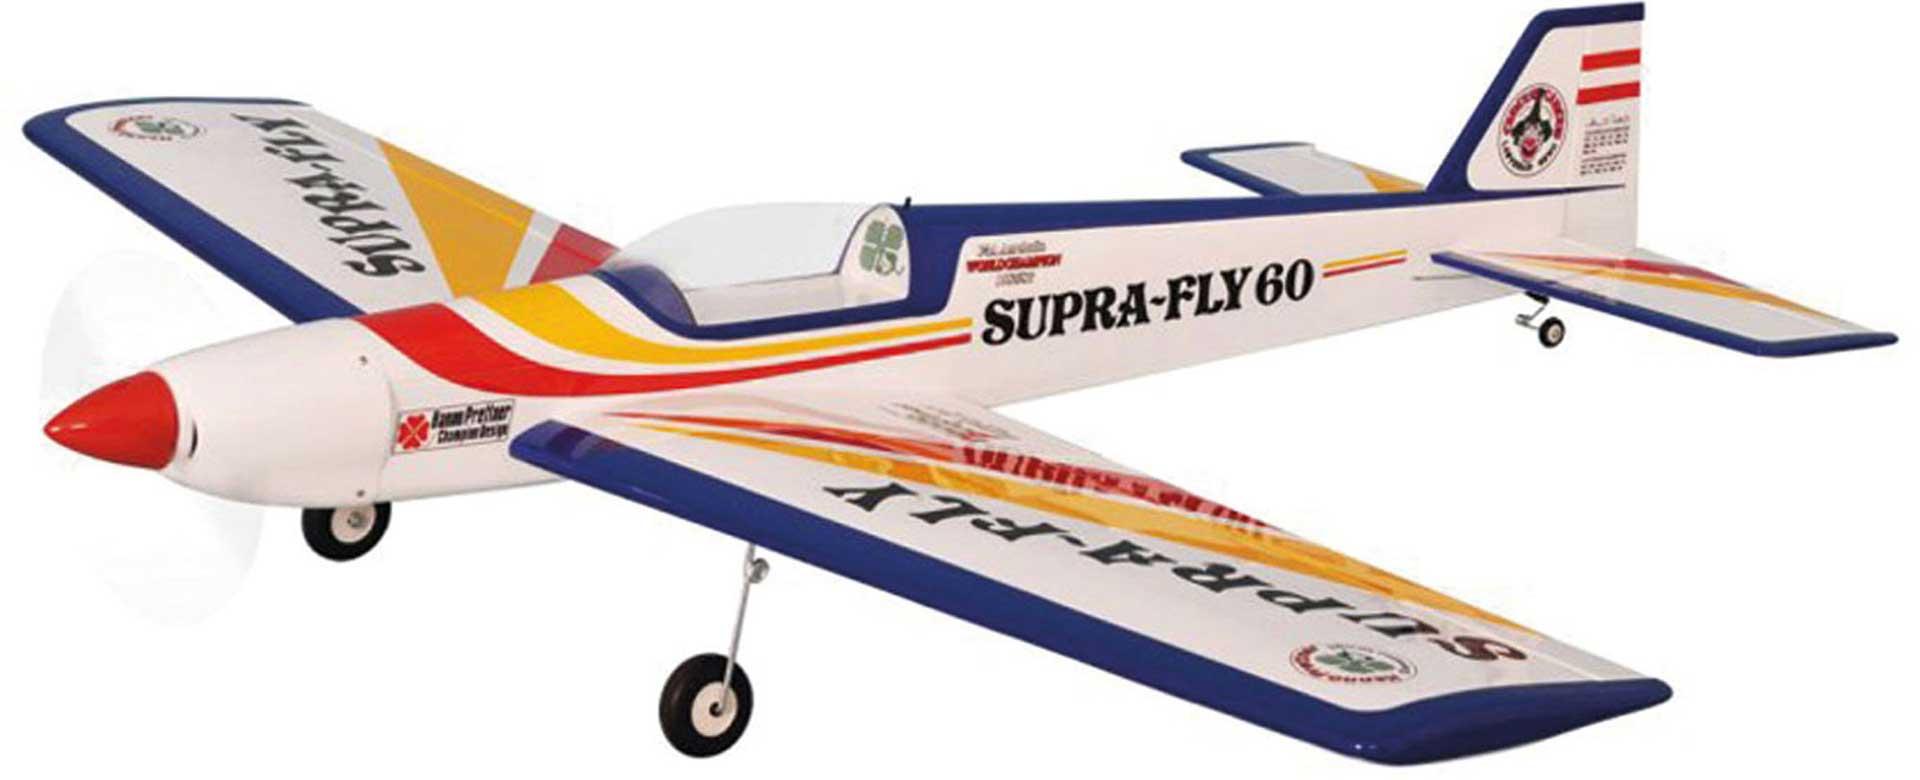 PICHLER SUPRA FLY 60 ROT/GELB 1720 MM ARF HANNO PRETTNER DESIGN .